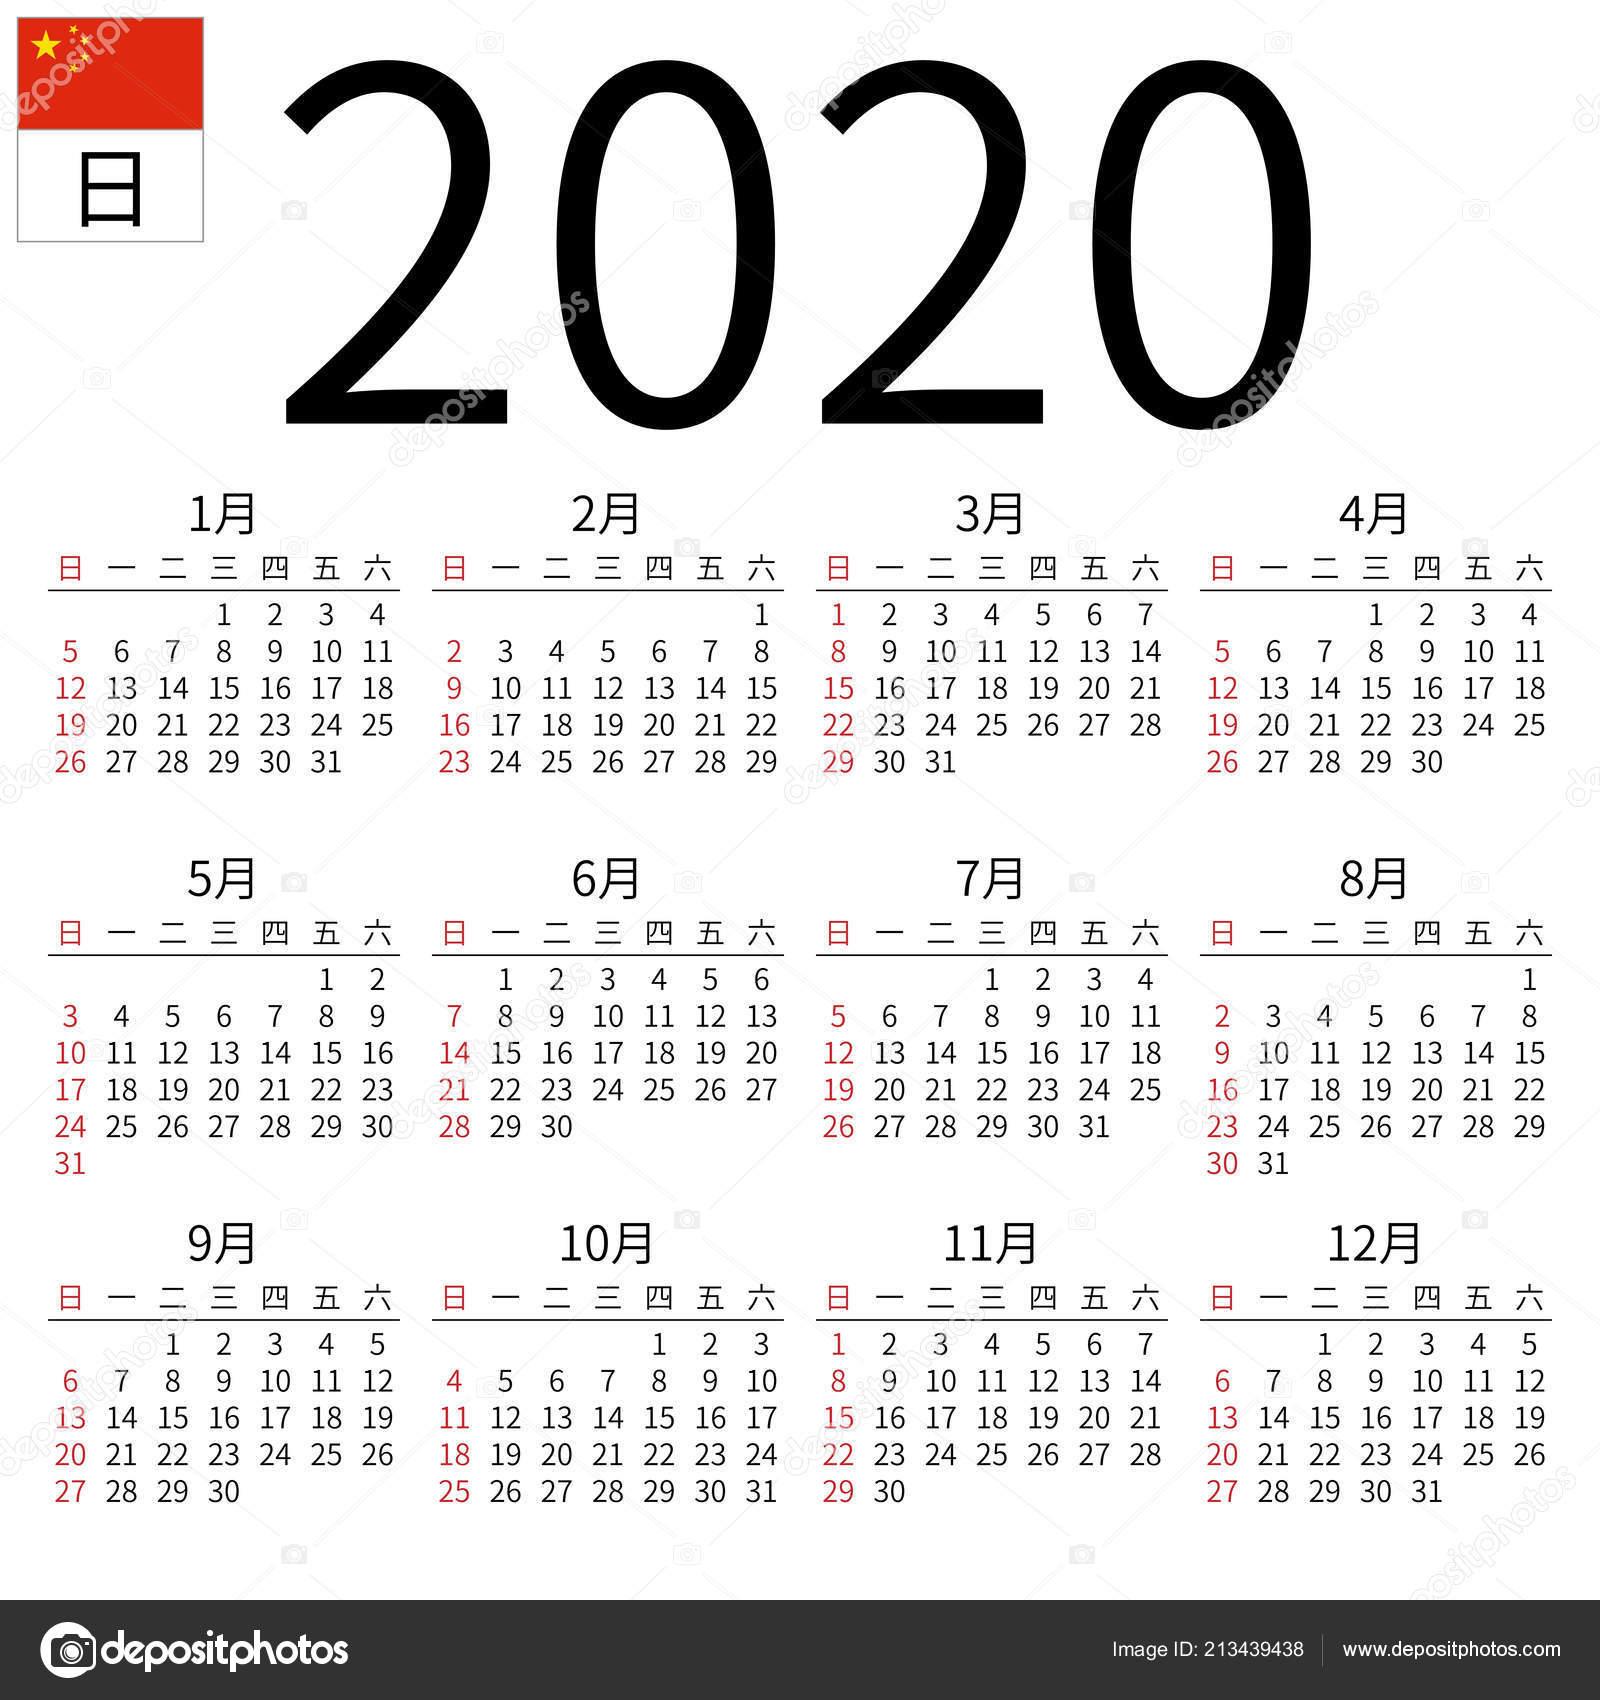 2020 Calendario Cinese.Calendario Parete Semplice Annuale Anno 2020 Lingua Cinese